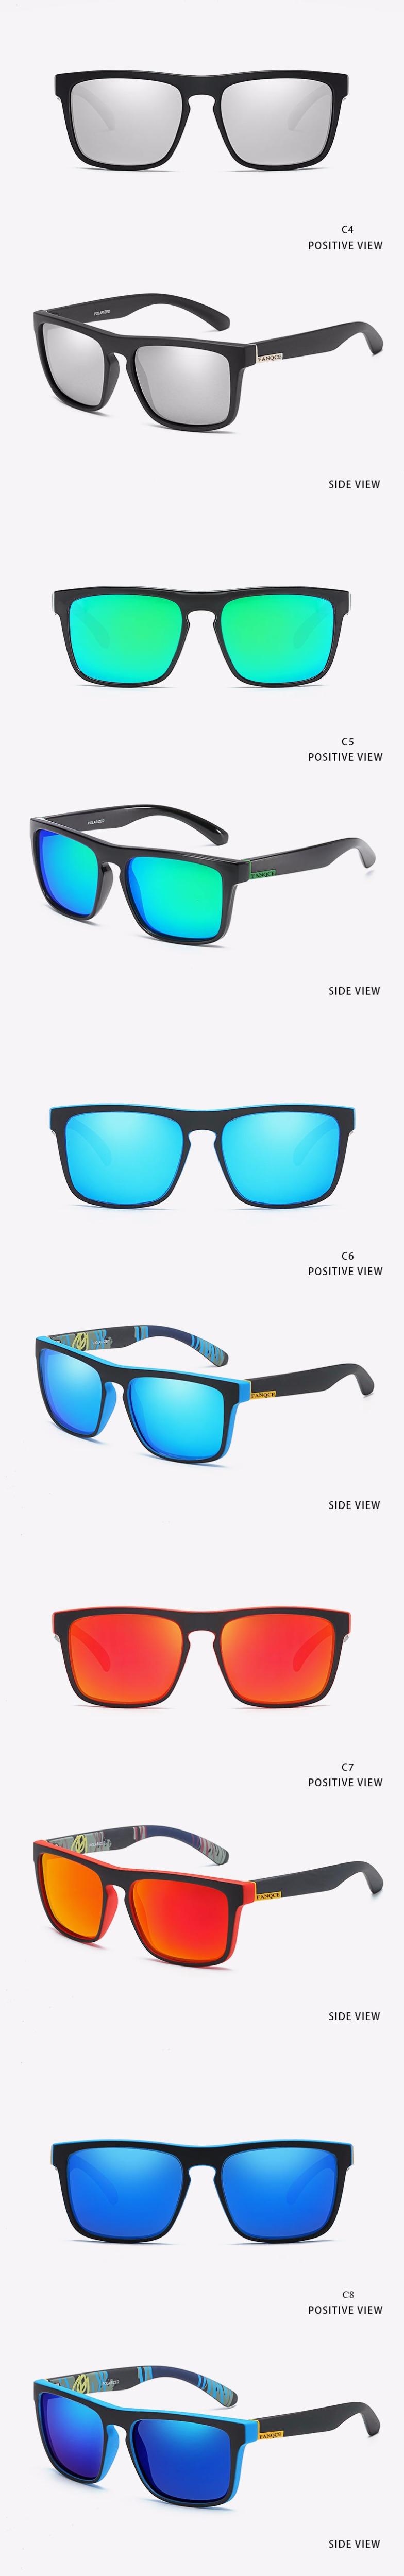 HTB1gdCTbL6H8KJjy0Fjq6yXepXaZ - Polarized 2018 New Hot Brand Designer Sunglasses Men Women For Car Driving Squared Rayed Mirror Sun Glasses Male Femlae Cool